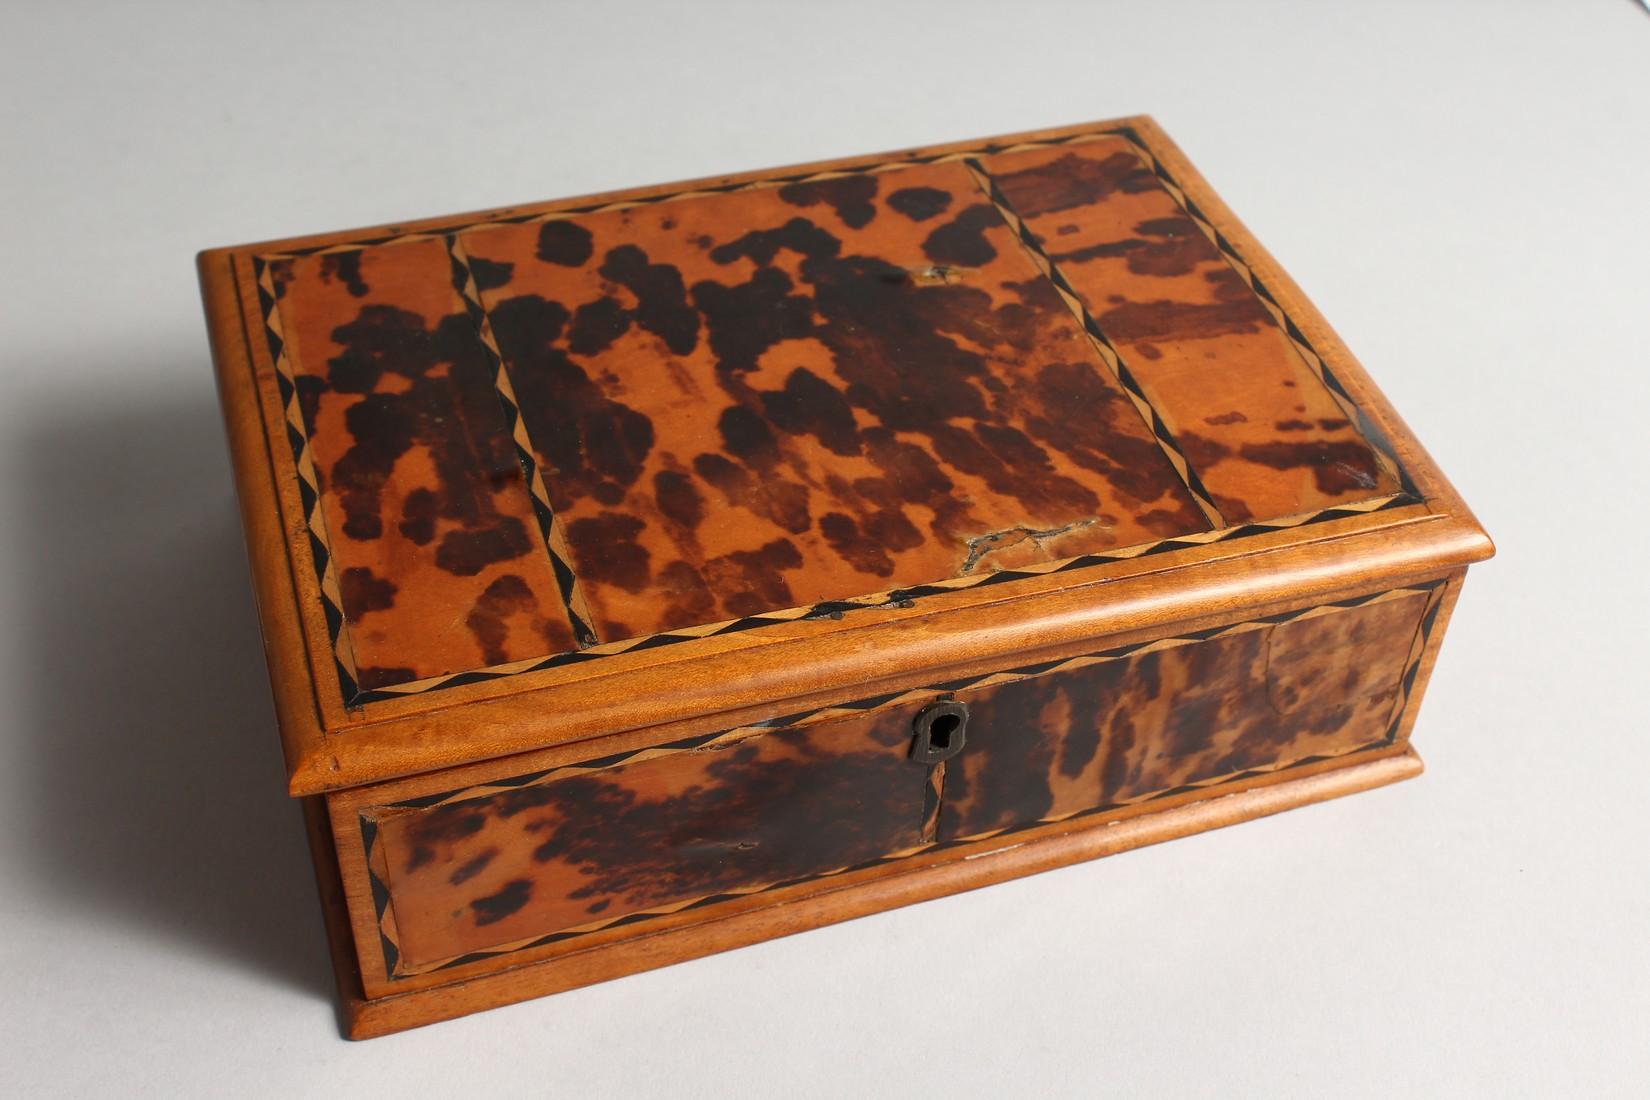 A TORTOISESHELL RECTANGULAR BOX AND COVER 8.5ins long.